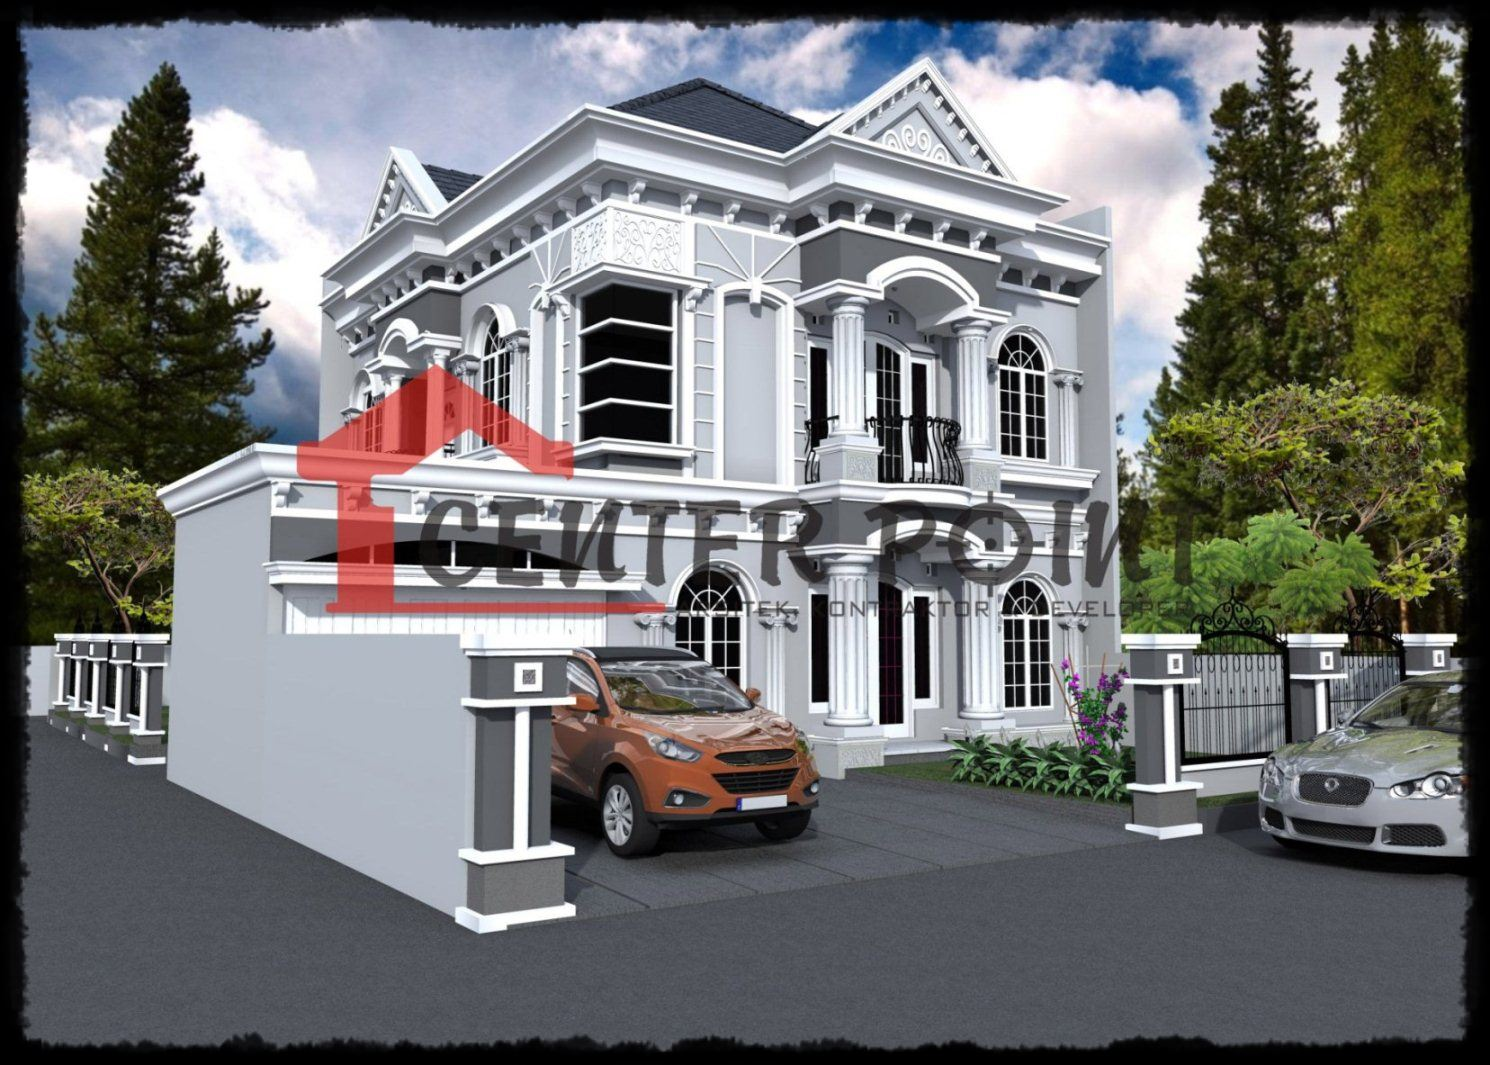 Jasa Arsitek Murah Probolinggo Jasa Desain Rumah Probolinggo